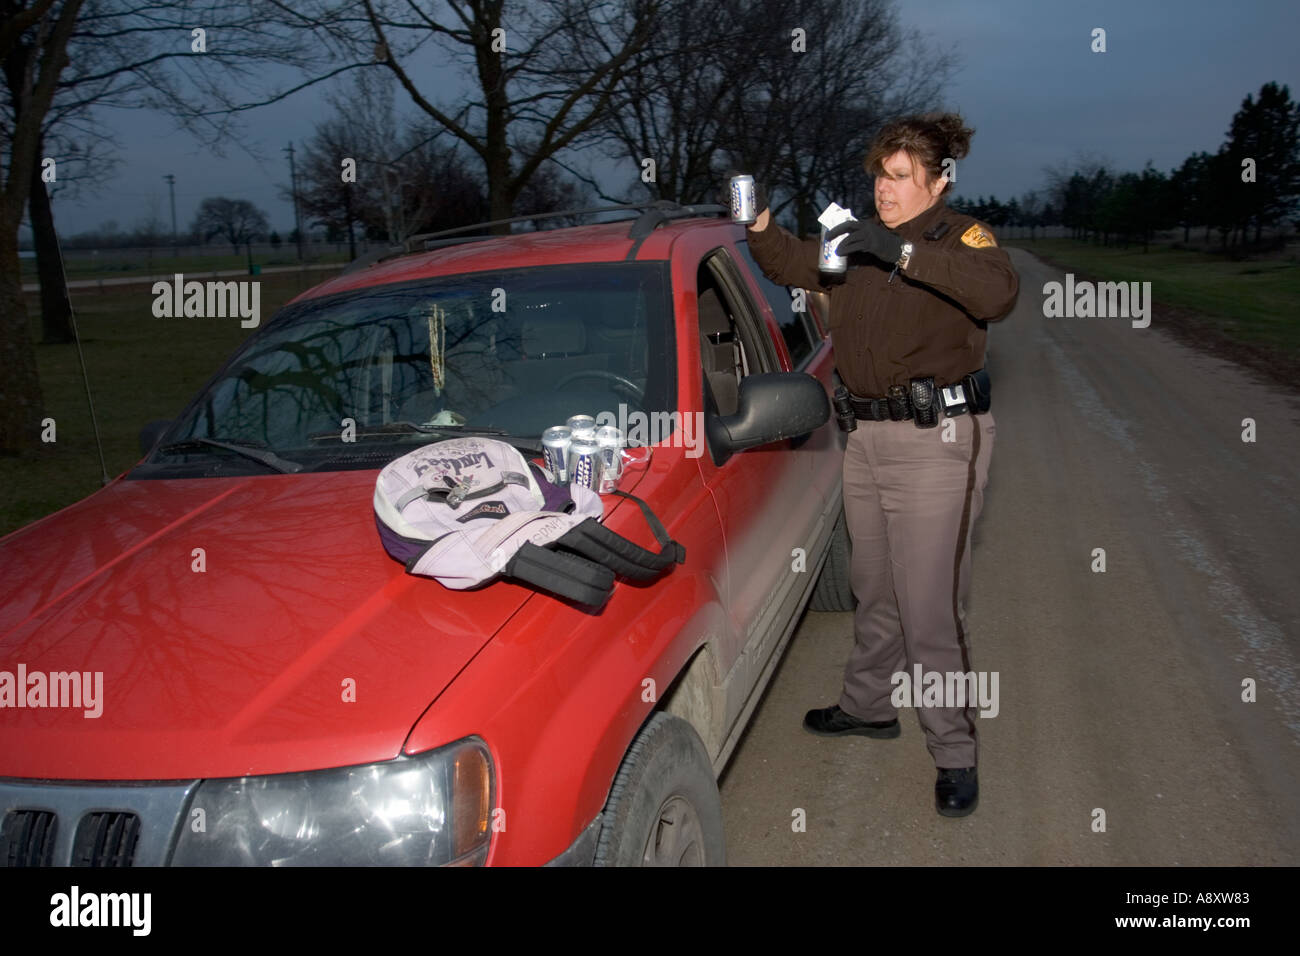 Sheriff s deputy investigating minors in possession of alcohol Saline County Sheriff s Office Nebraska USA - Stock Image